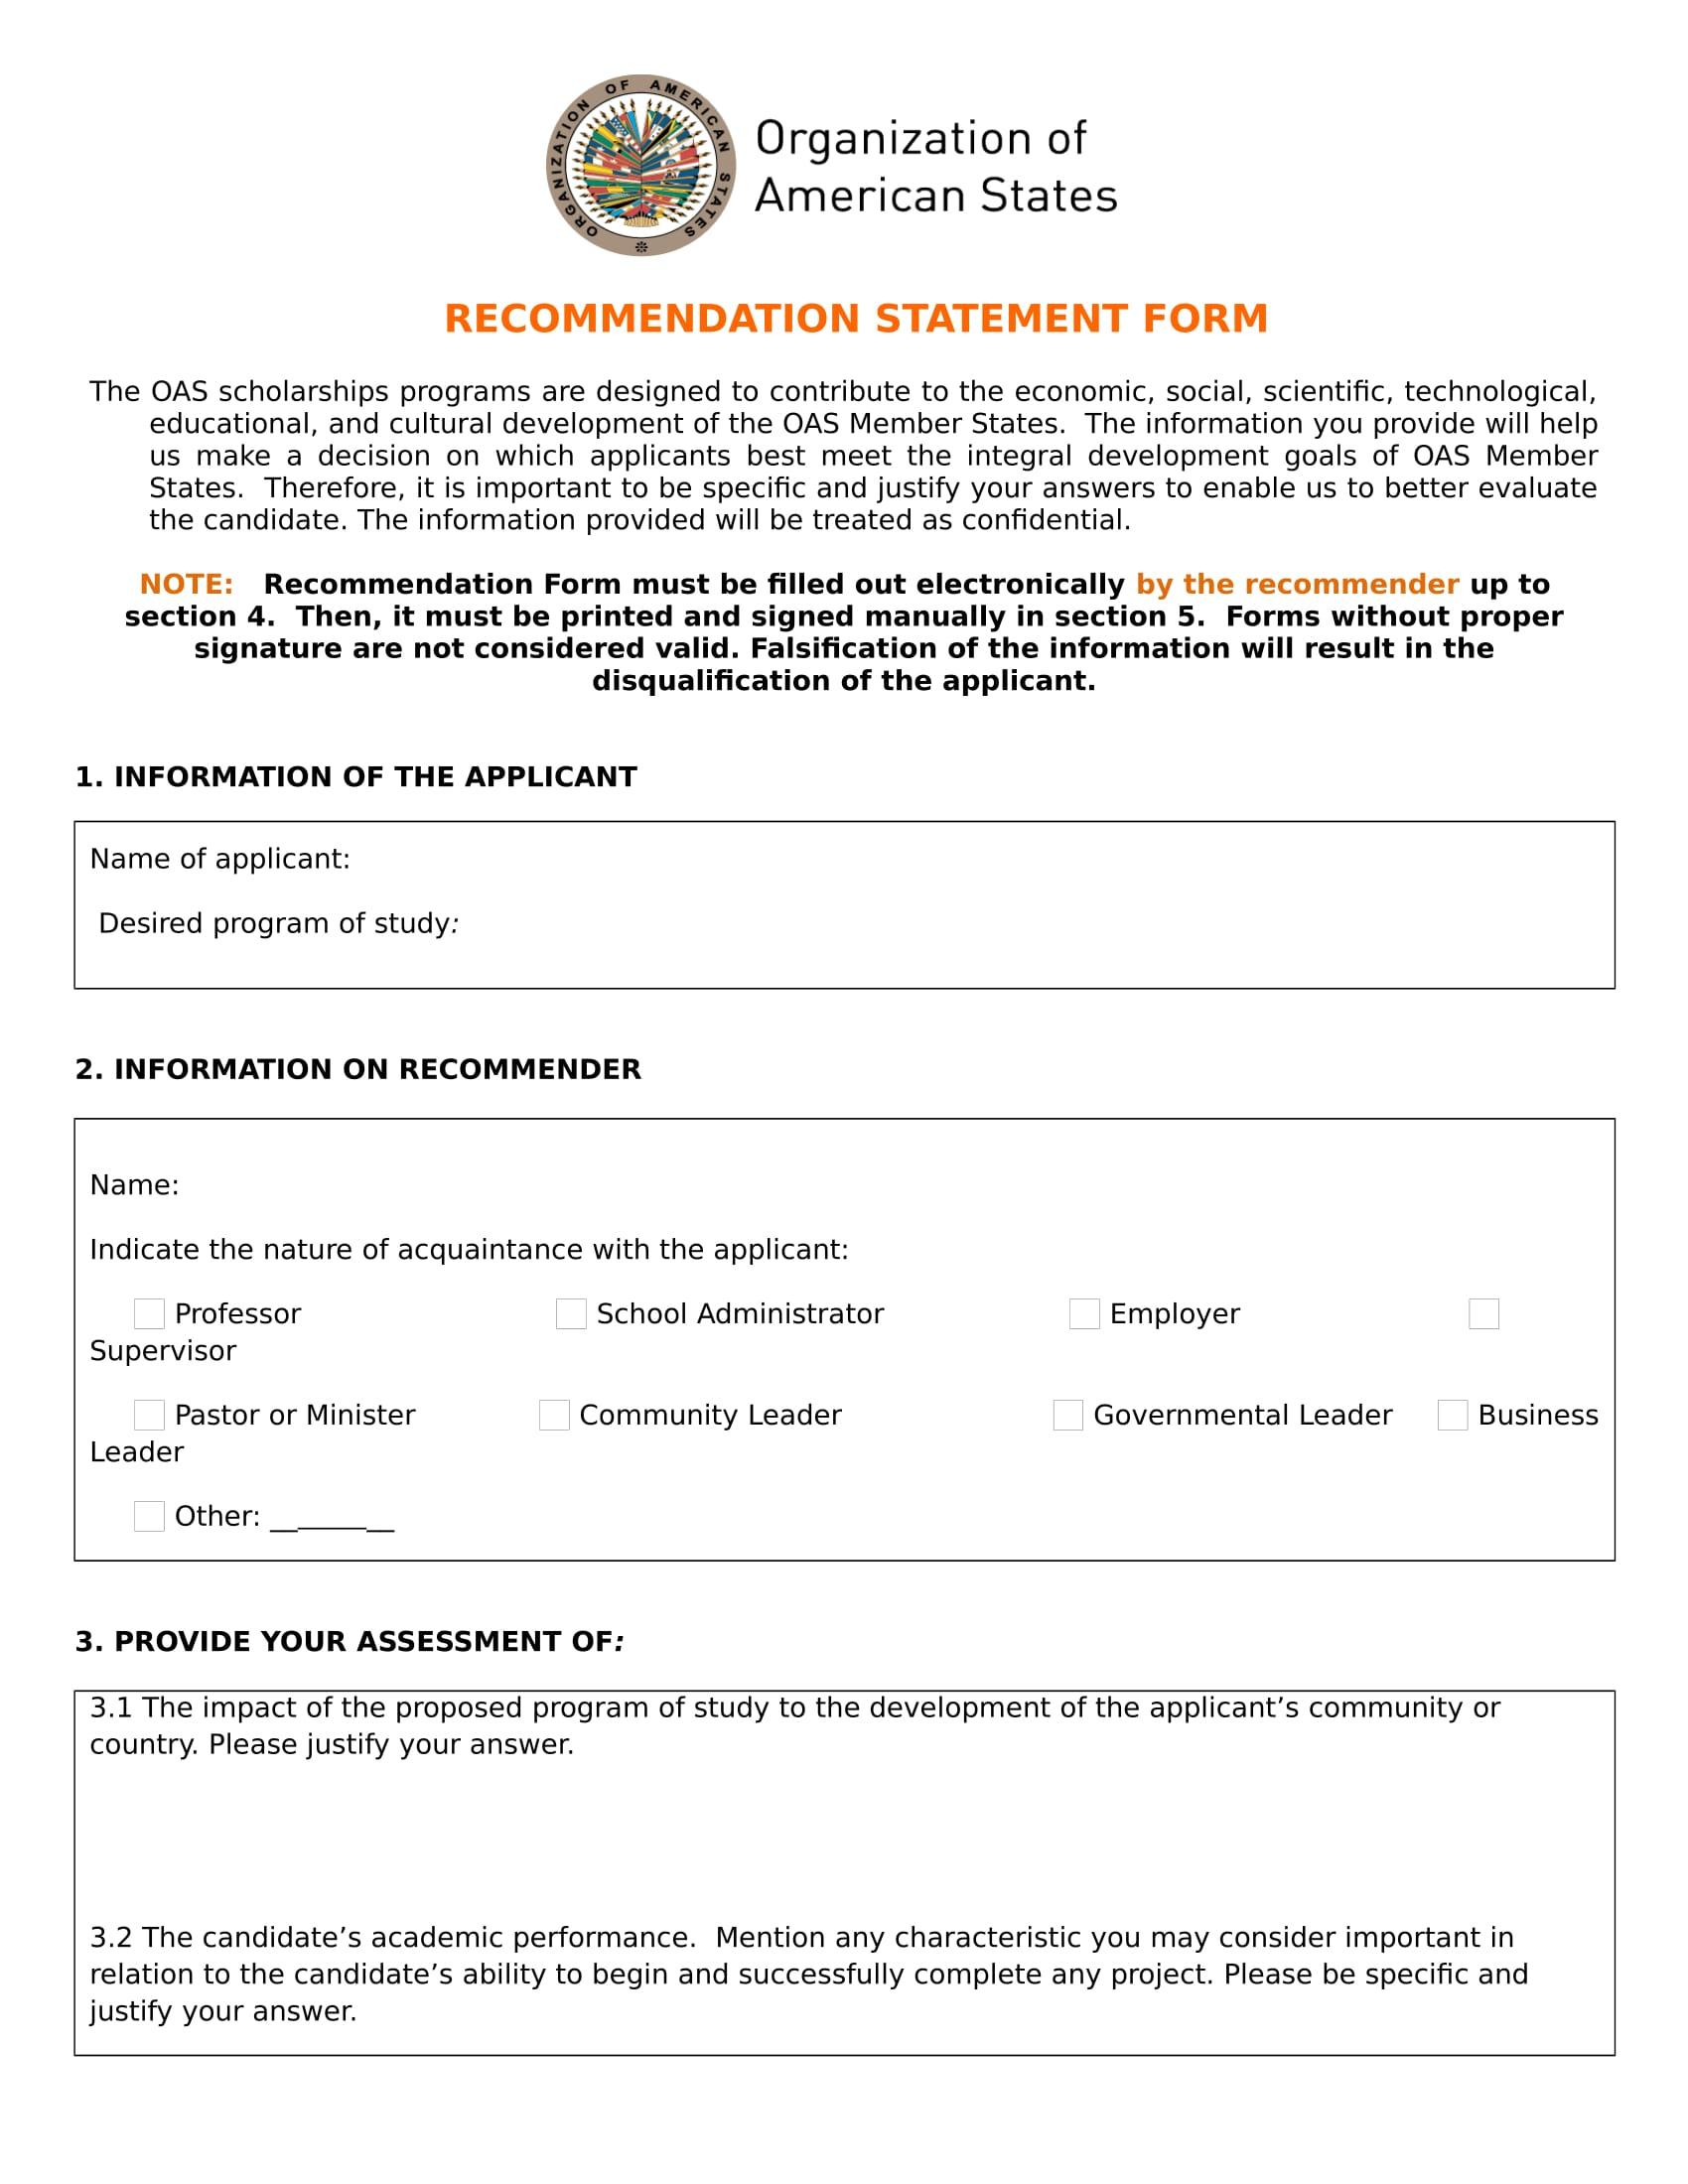 recommendation statement form sample 1